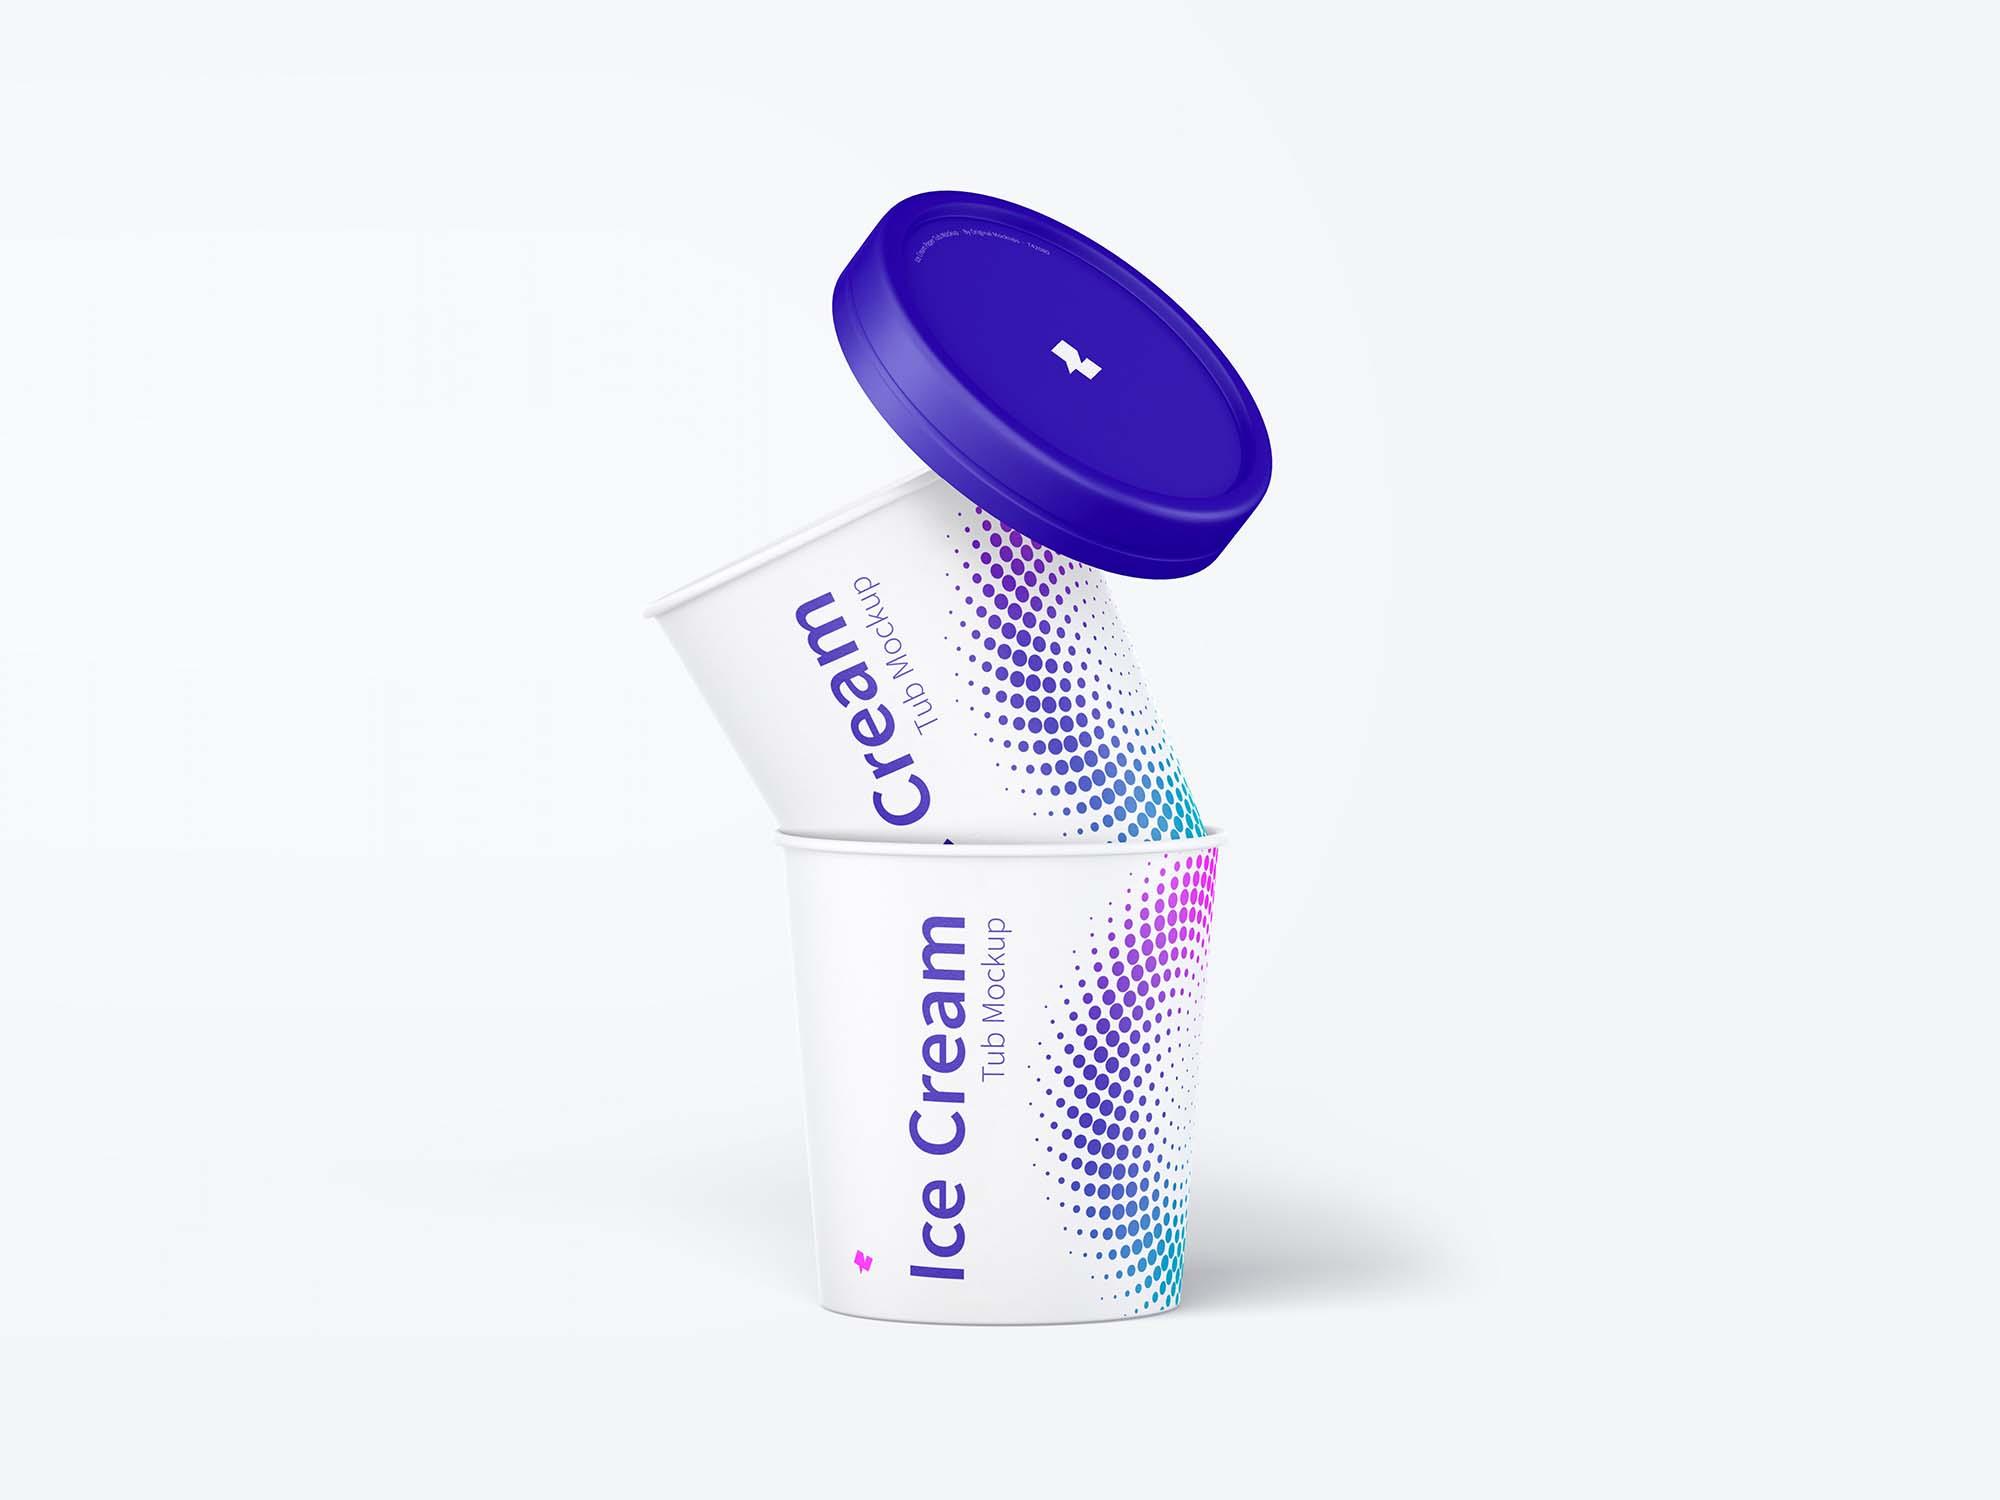 ce Cream Paper Tub Mockup